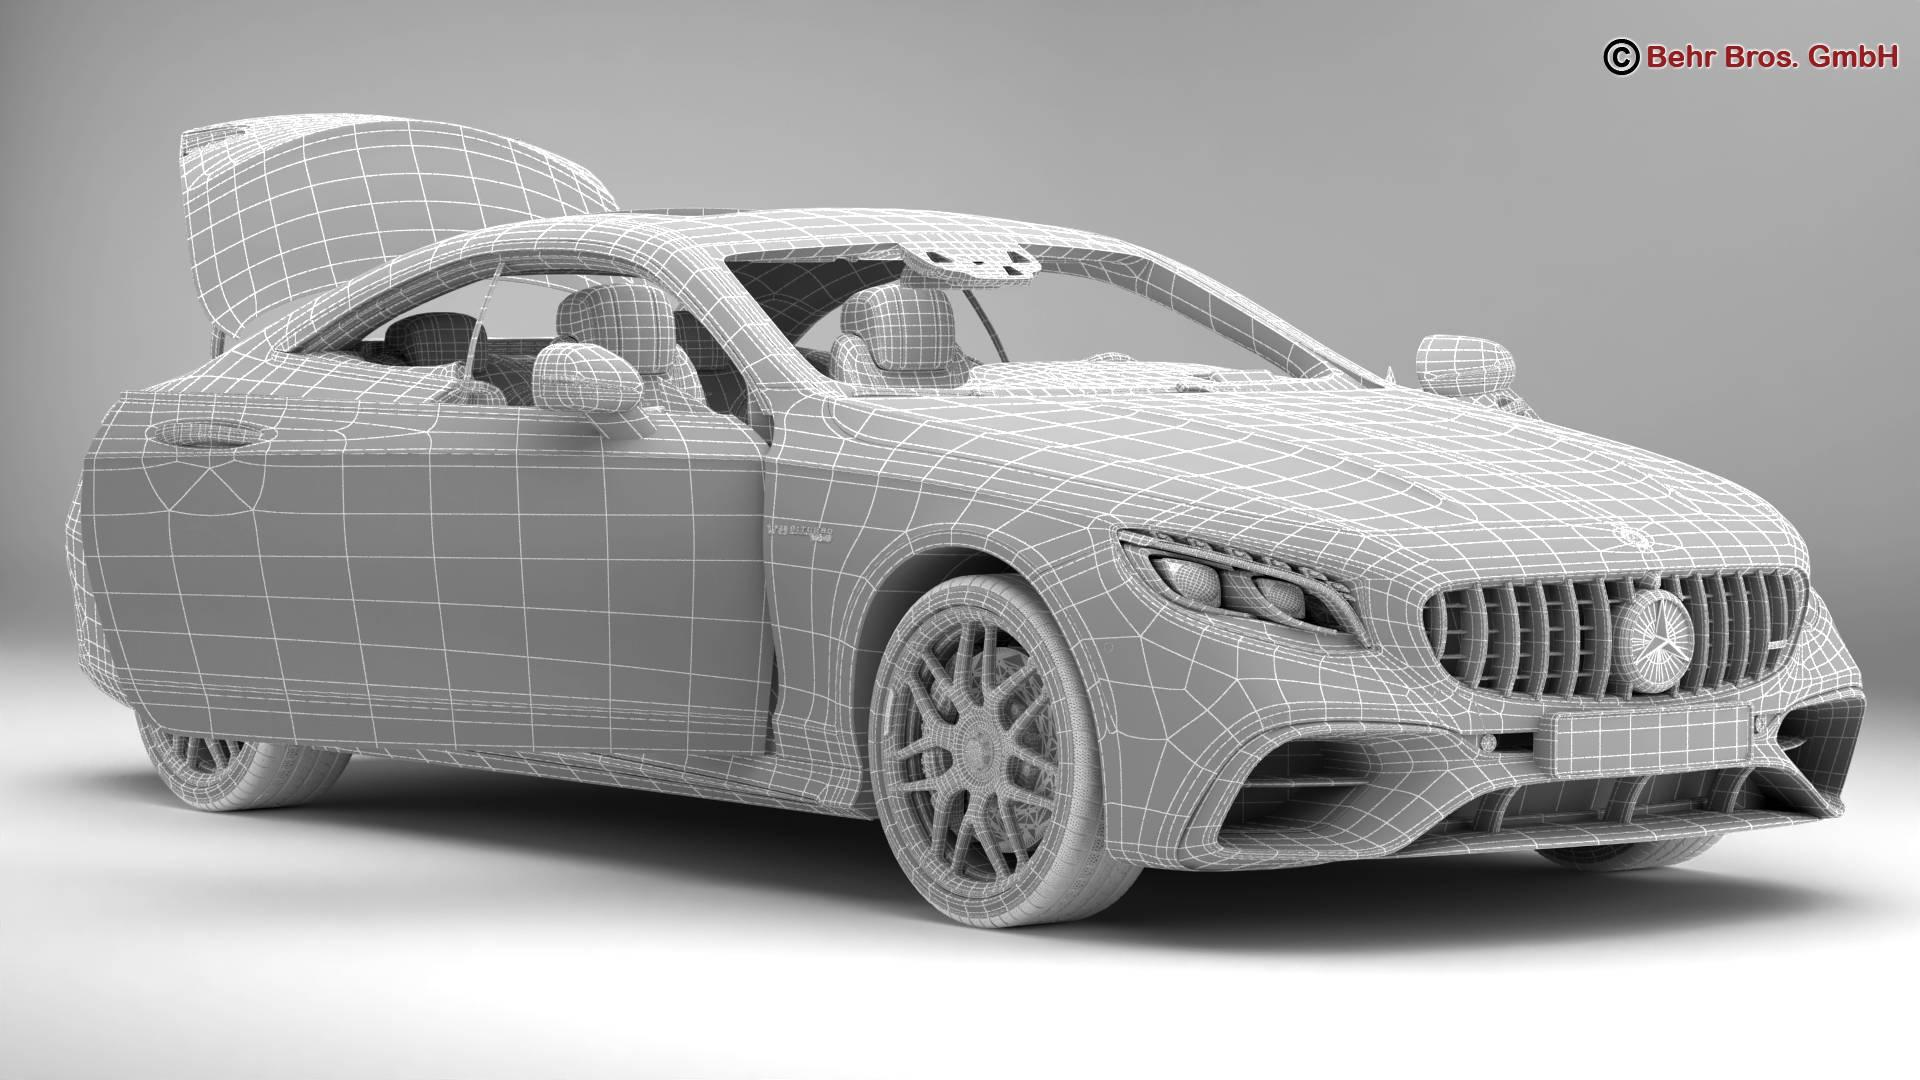 mercedes s class coupe amg s63 2018 3d model 3ds max fbx c4d lwo ma mb obj 274106